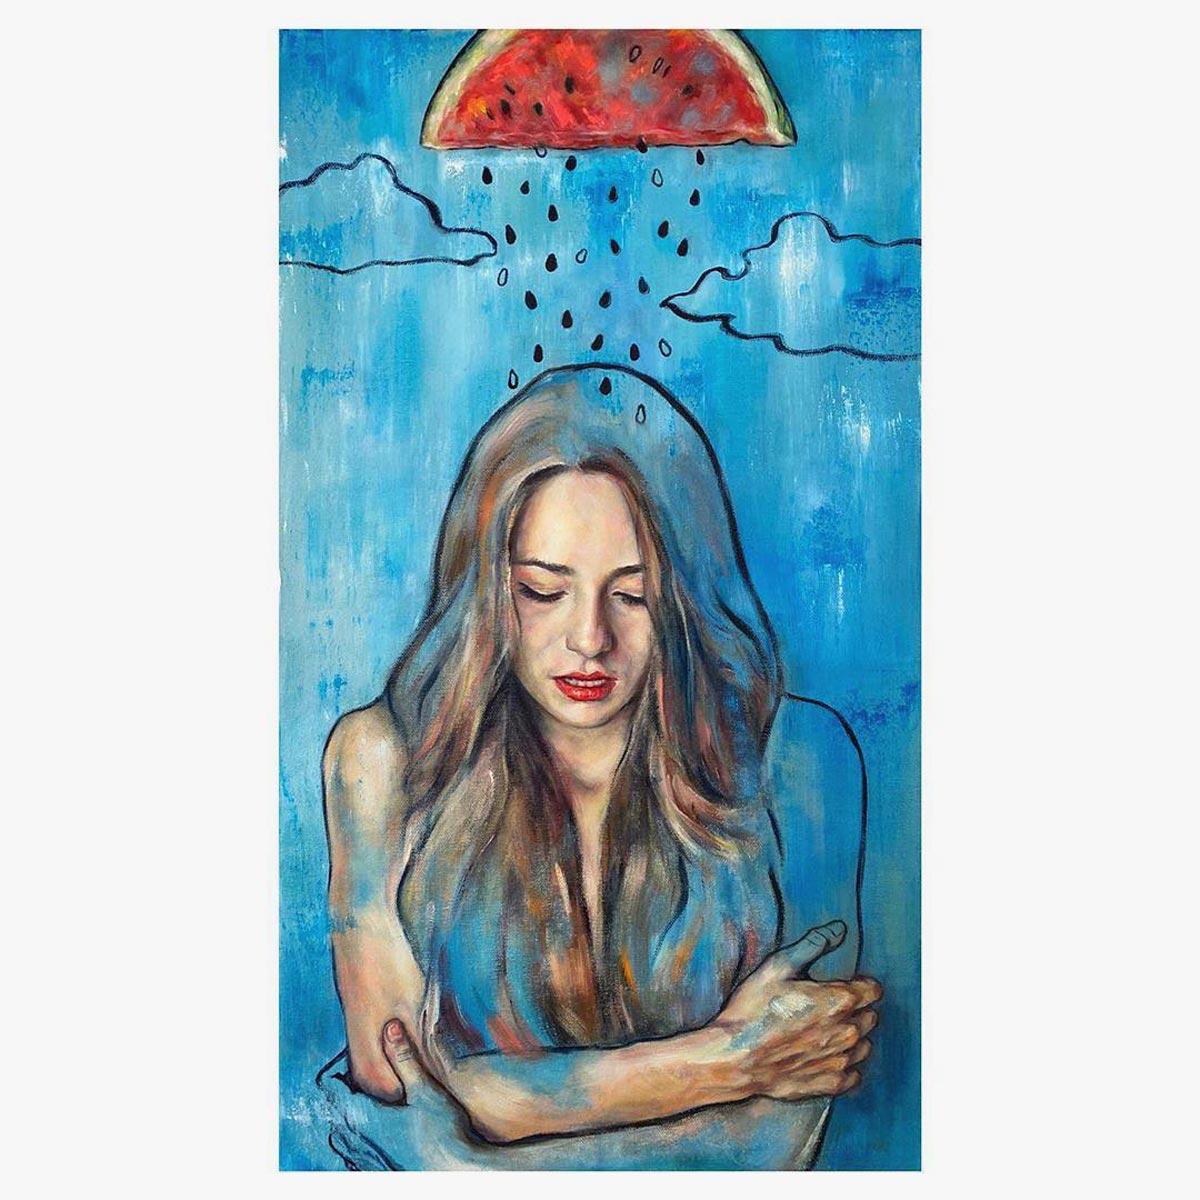 Sin Galeria, Watermelon rain